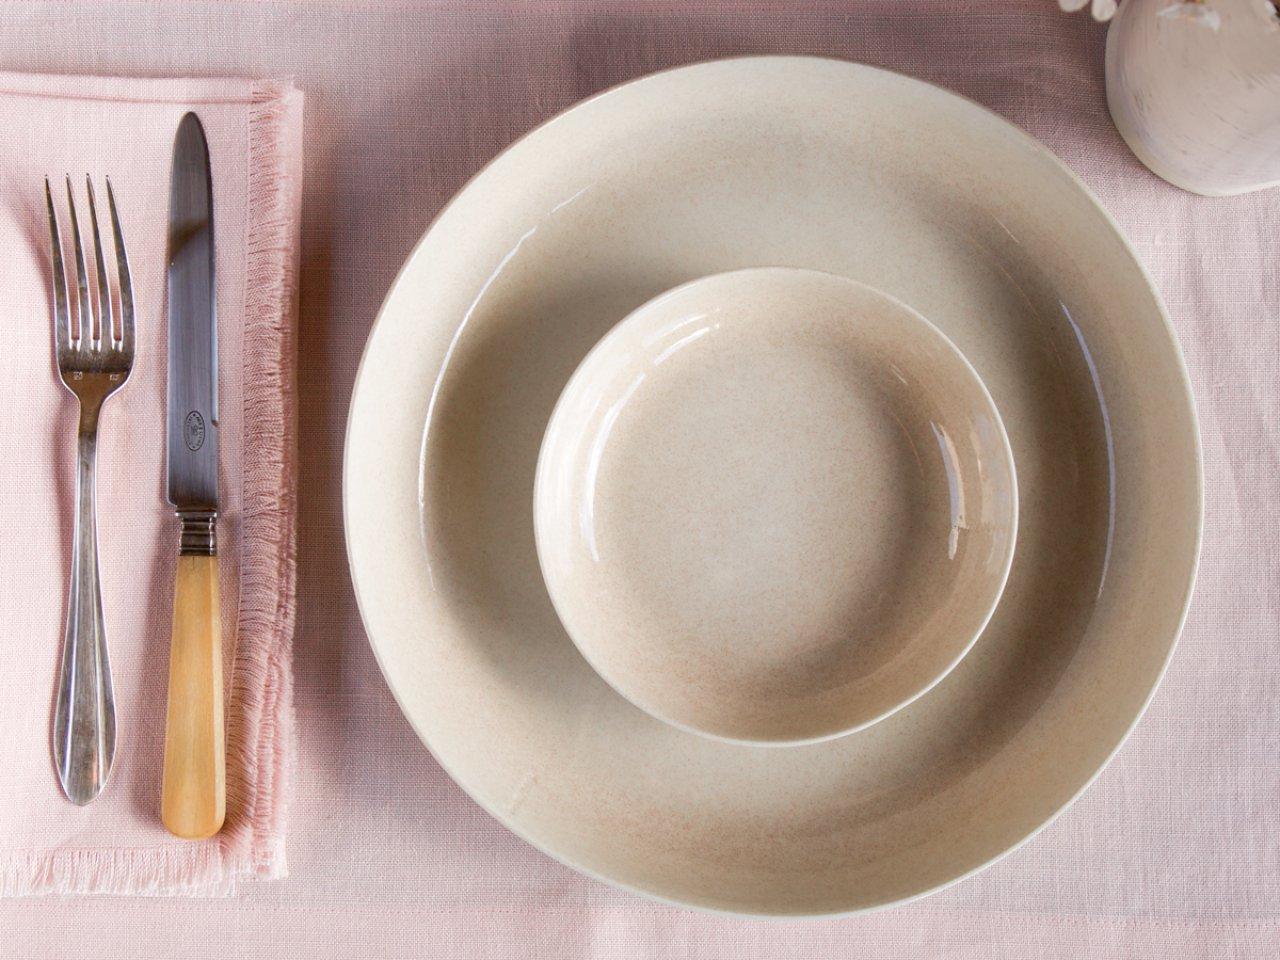 Cornwall Plates ($68 -$90)